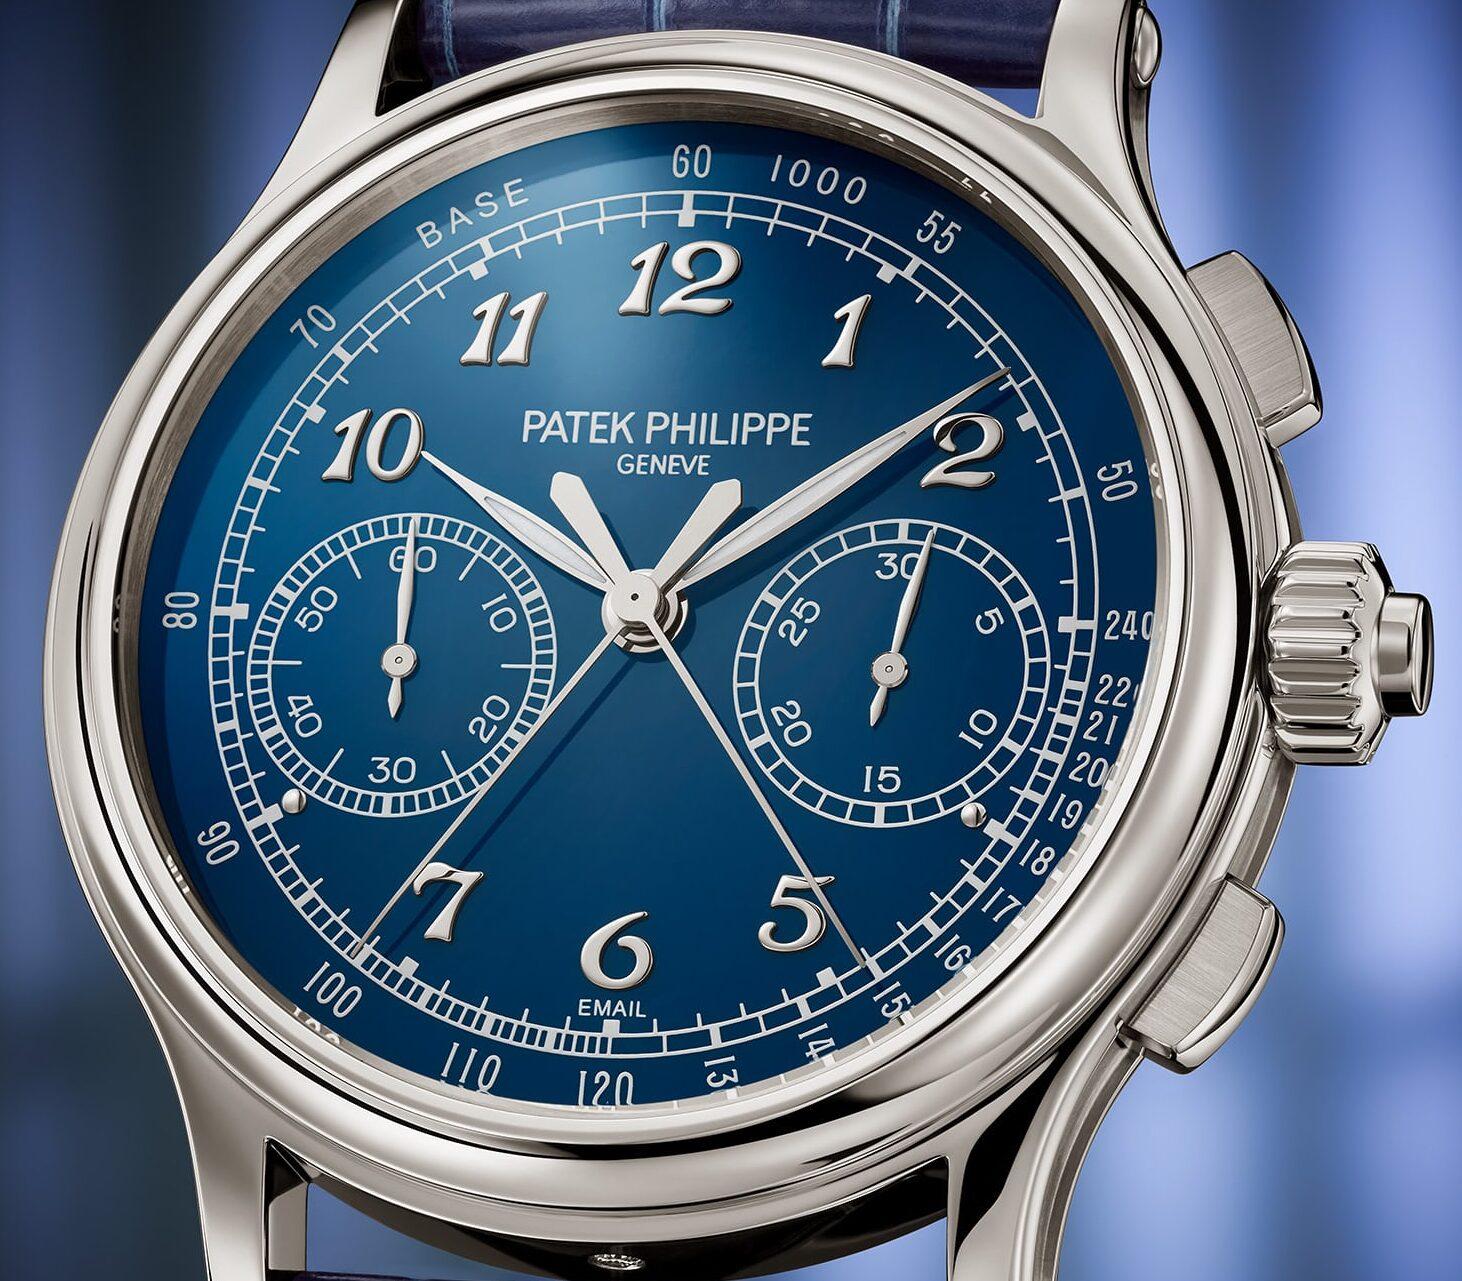 Patek Philippe Split Seconds Chronograph Ref 5370P hero